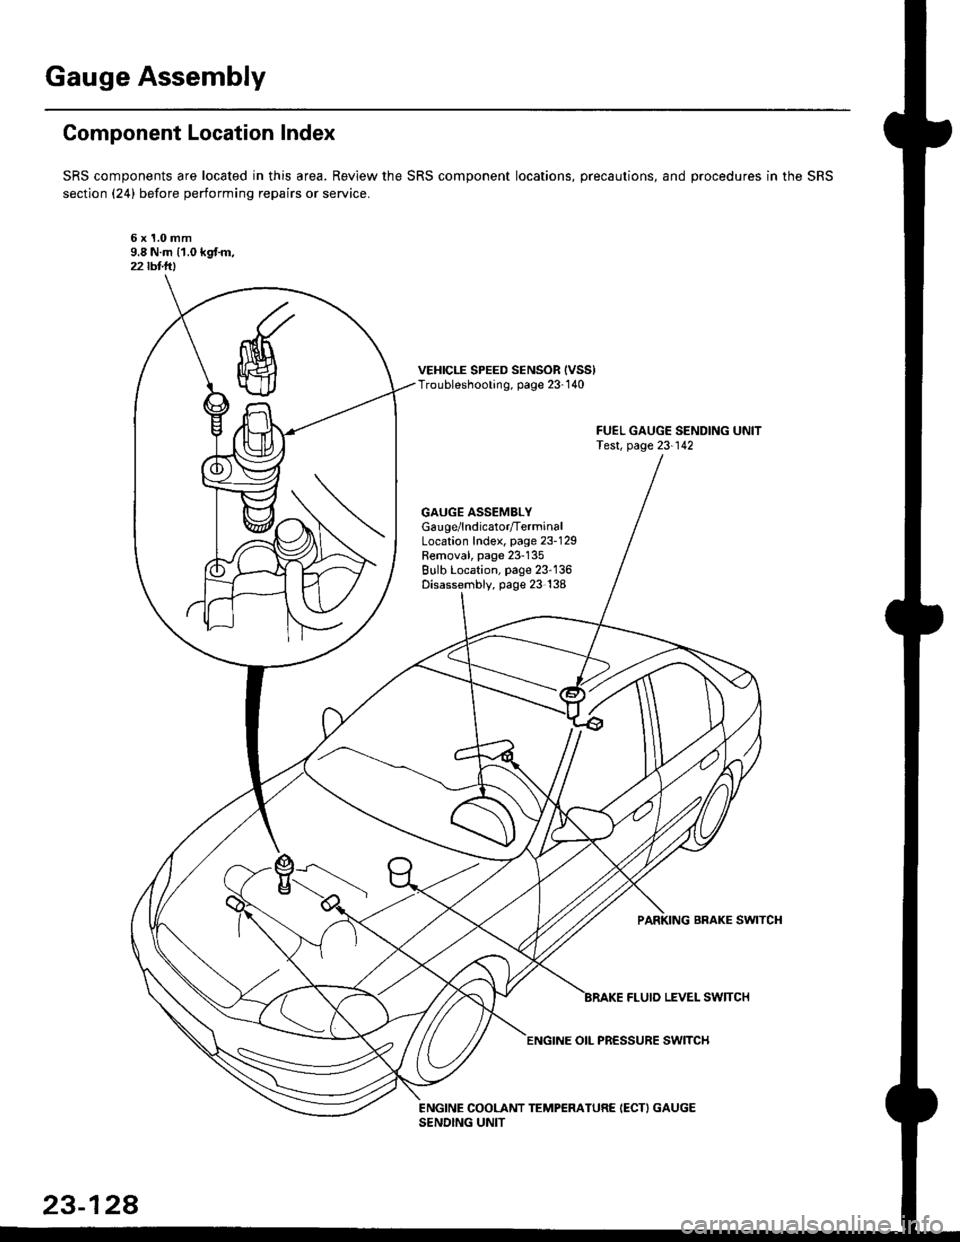 Oil Level Honda Civic 1997 6g Workshop Manual 1999 Accord Sending Unit Page 1598